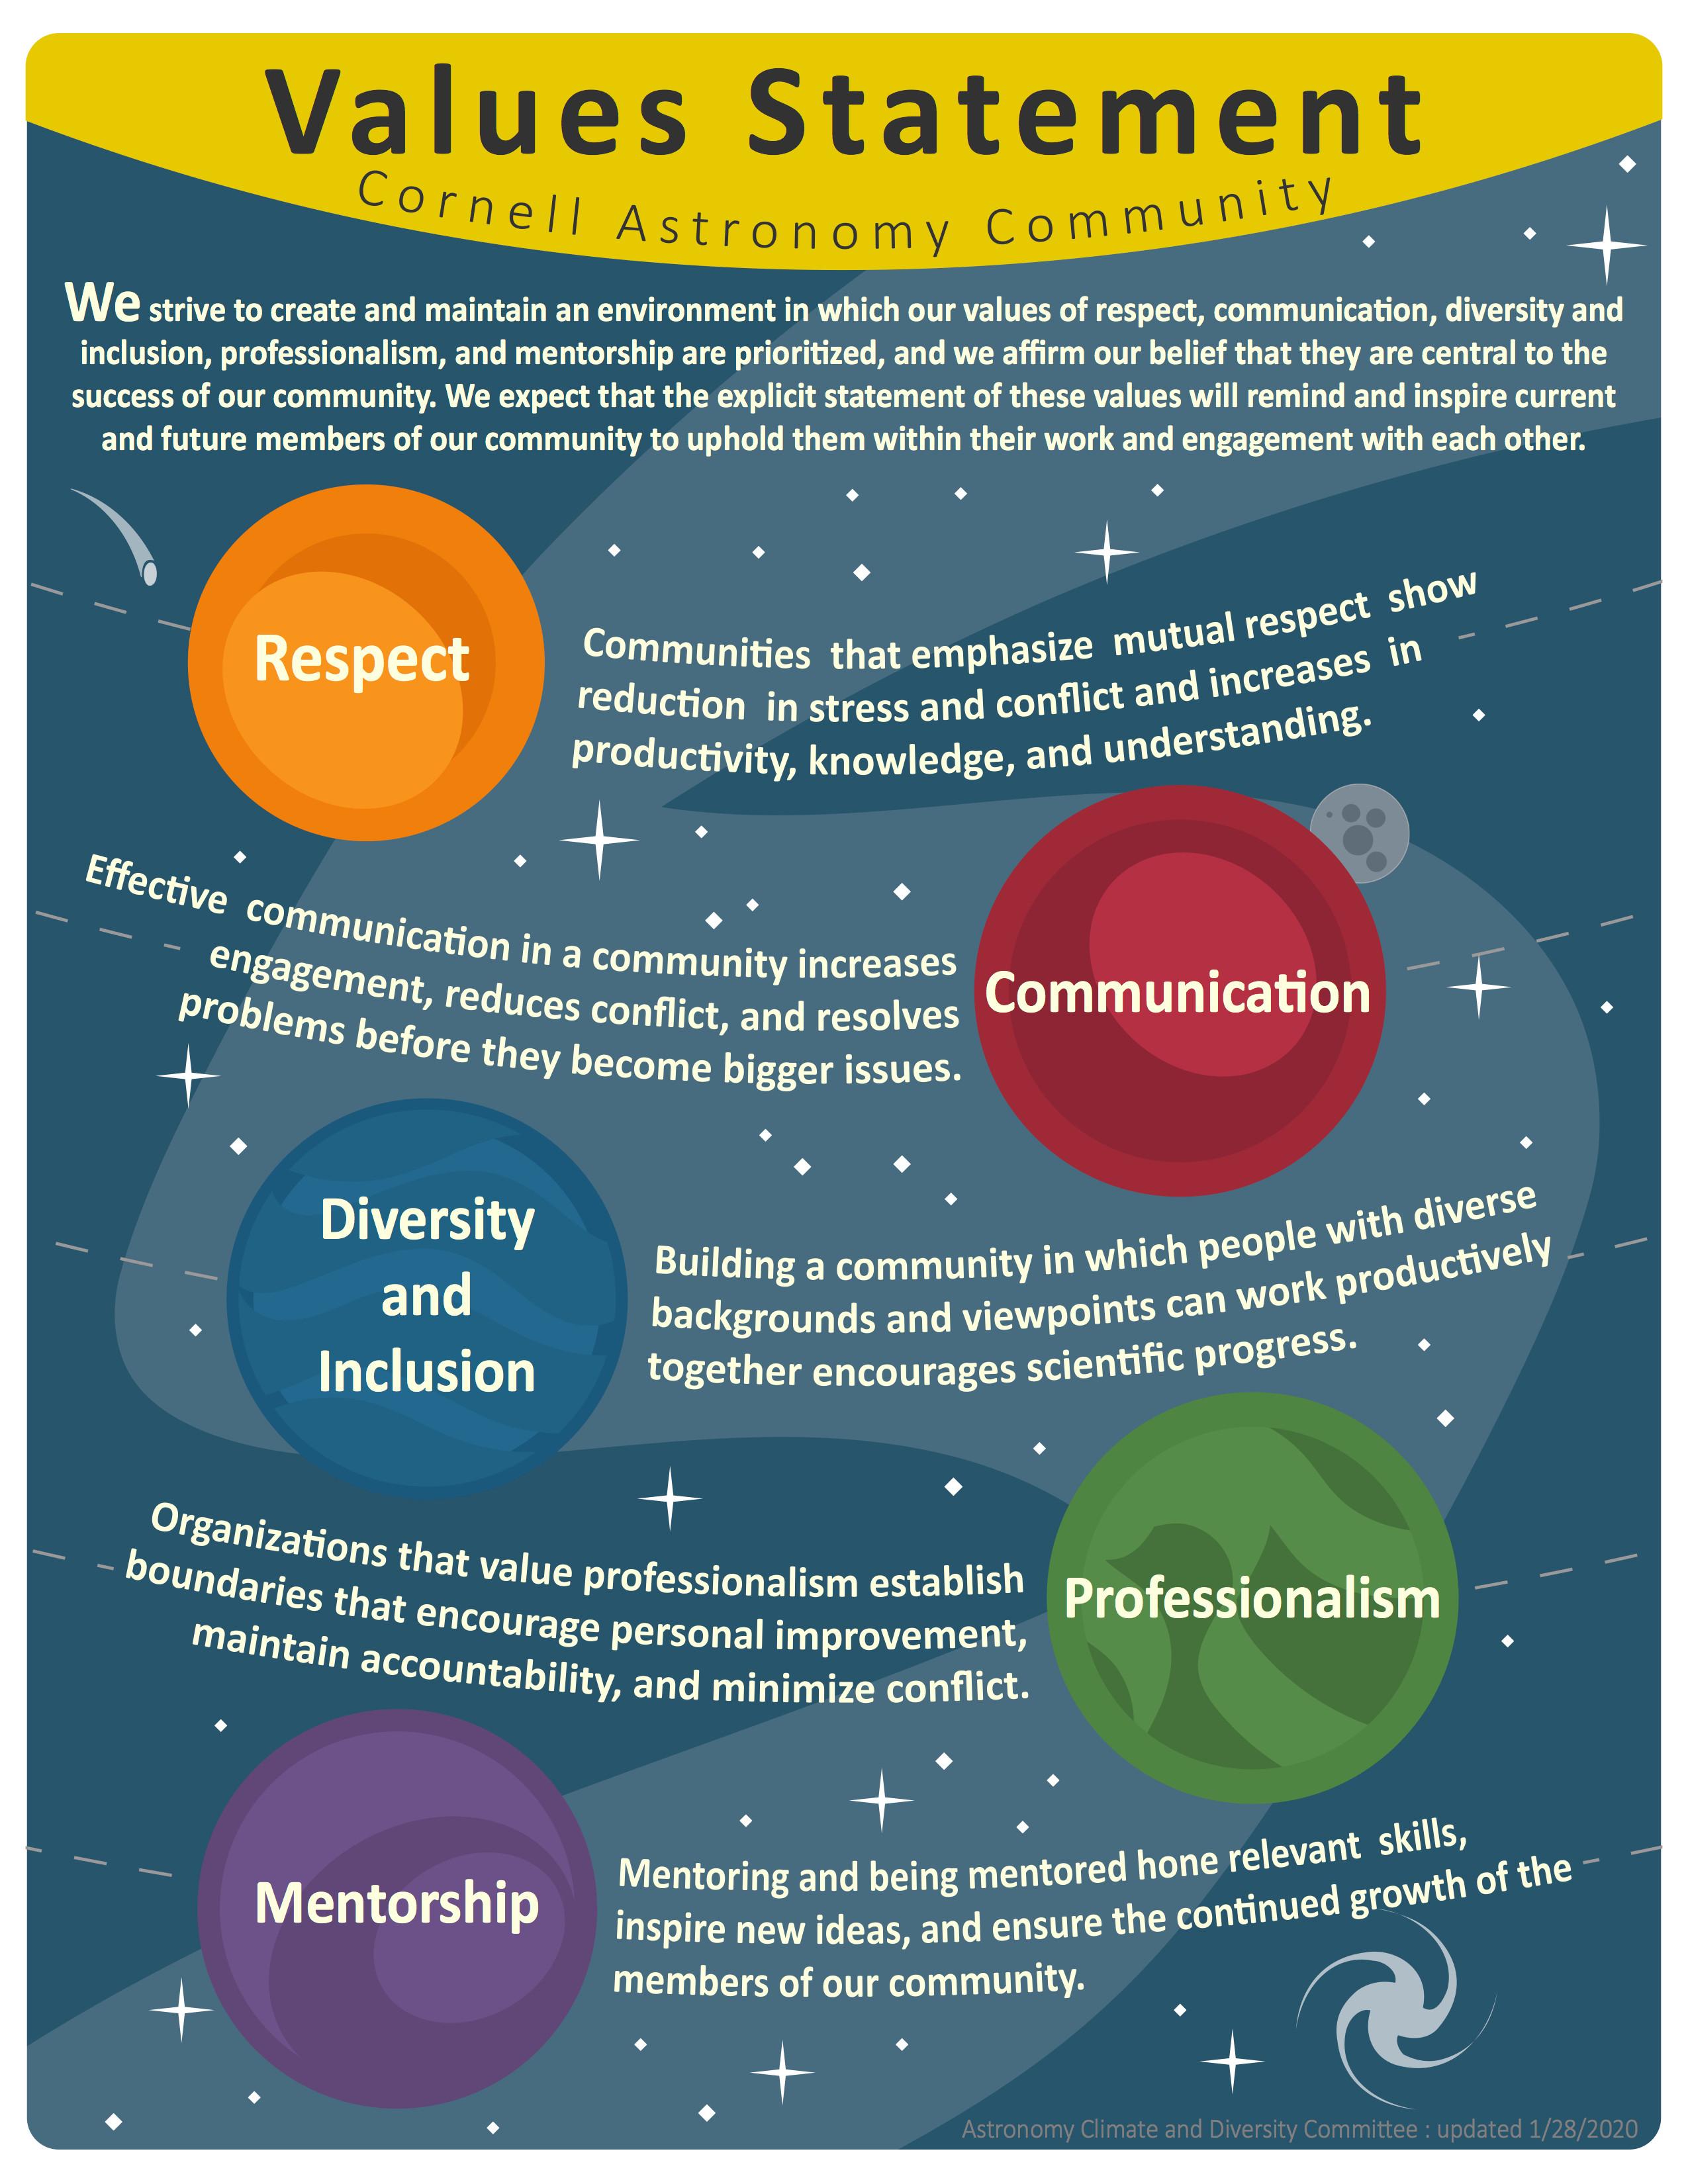 Poster form https://jmadden.org/pdfs/ValuesPoster.pdf